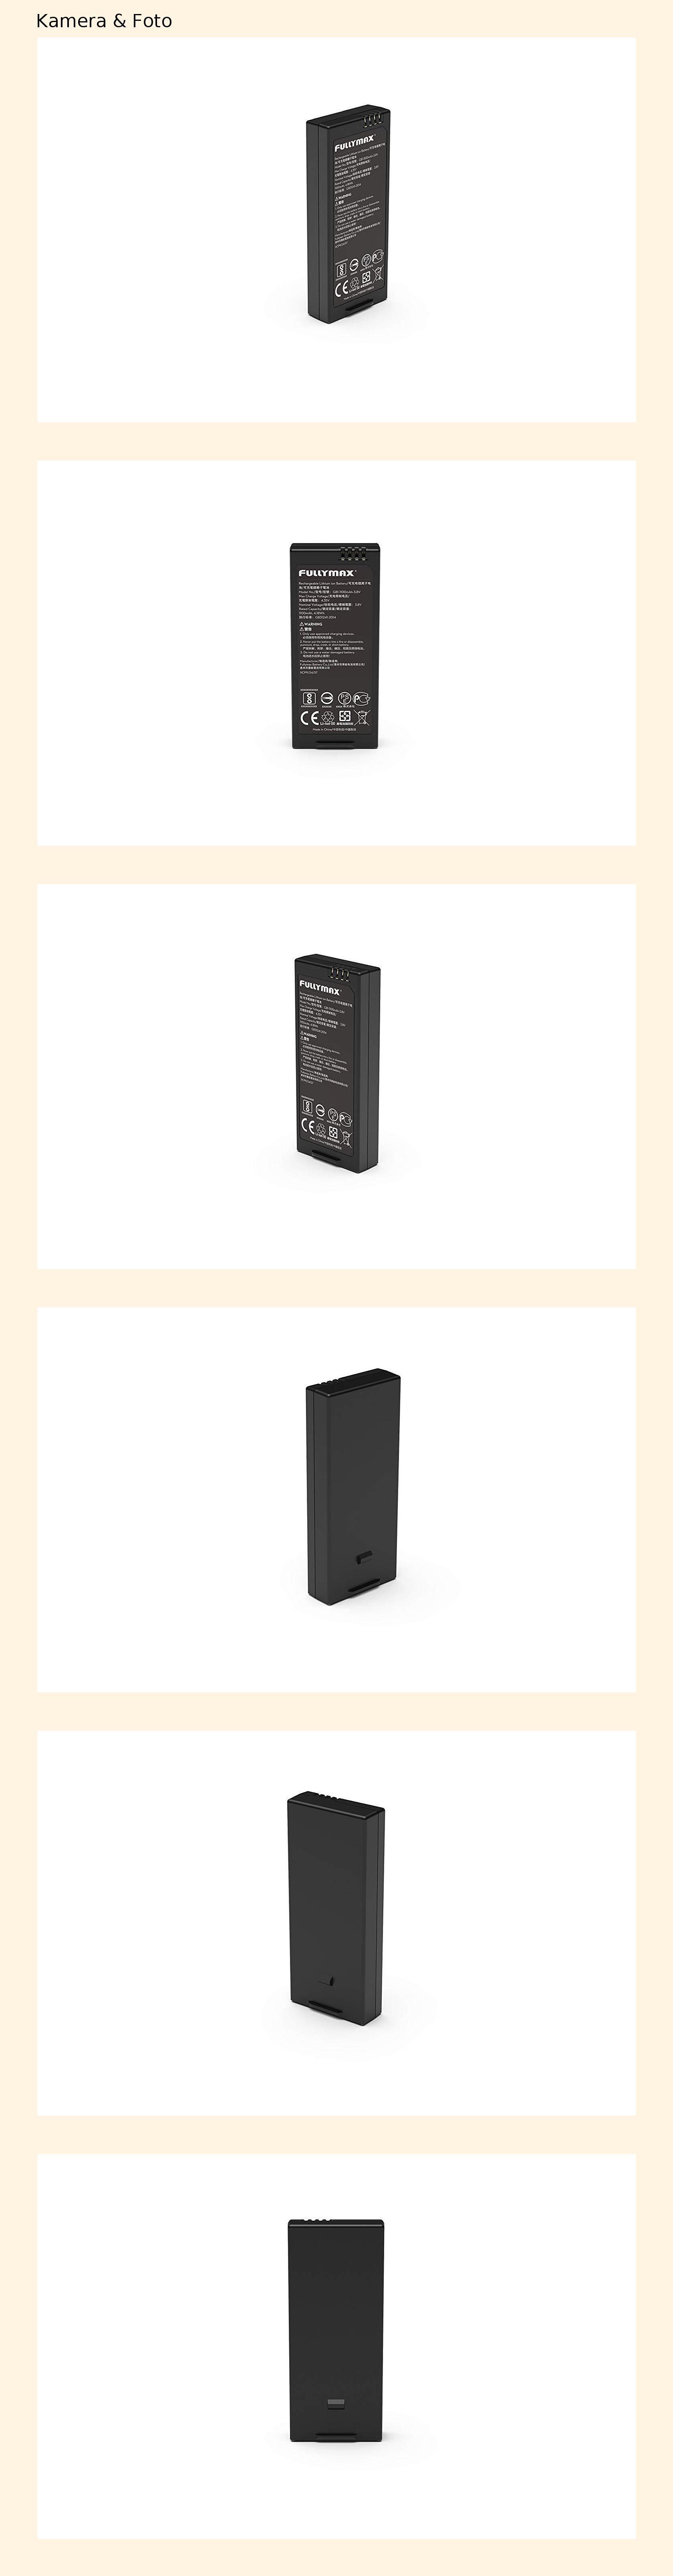 1100 mAh Ryze DJI Tello Batterie für Mini-Drohne mit Micro-USB-Anschluss